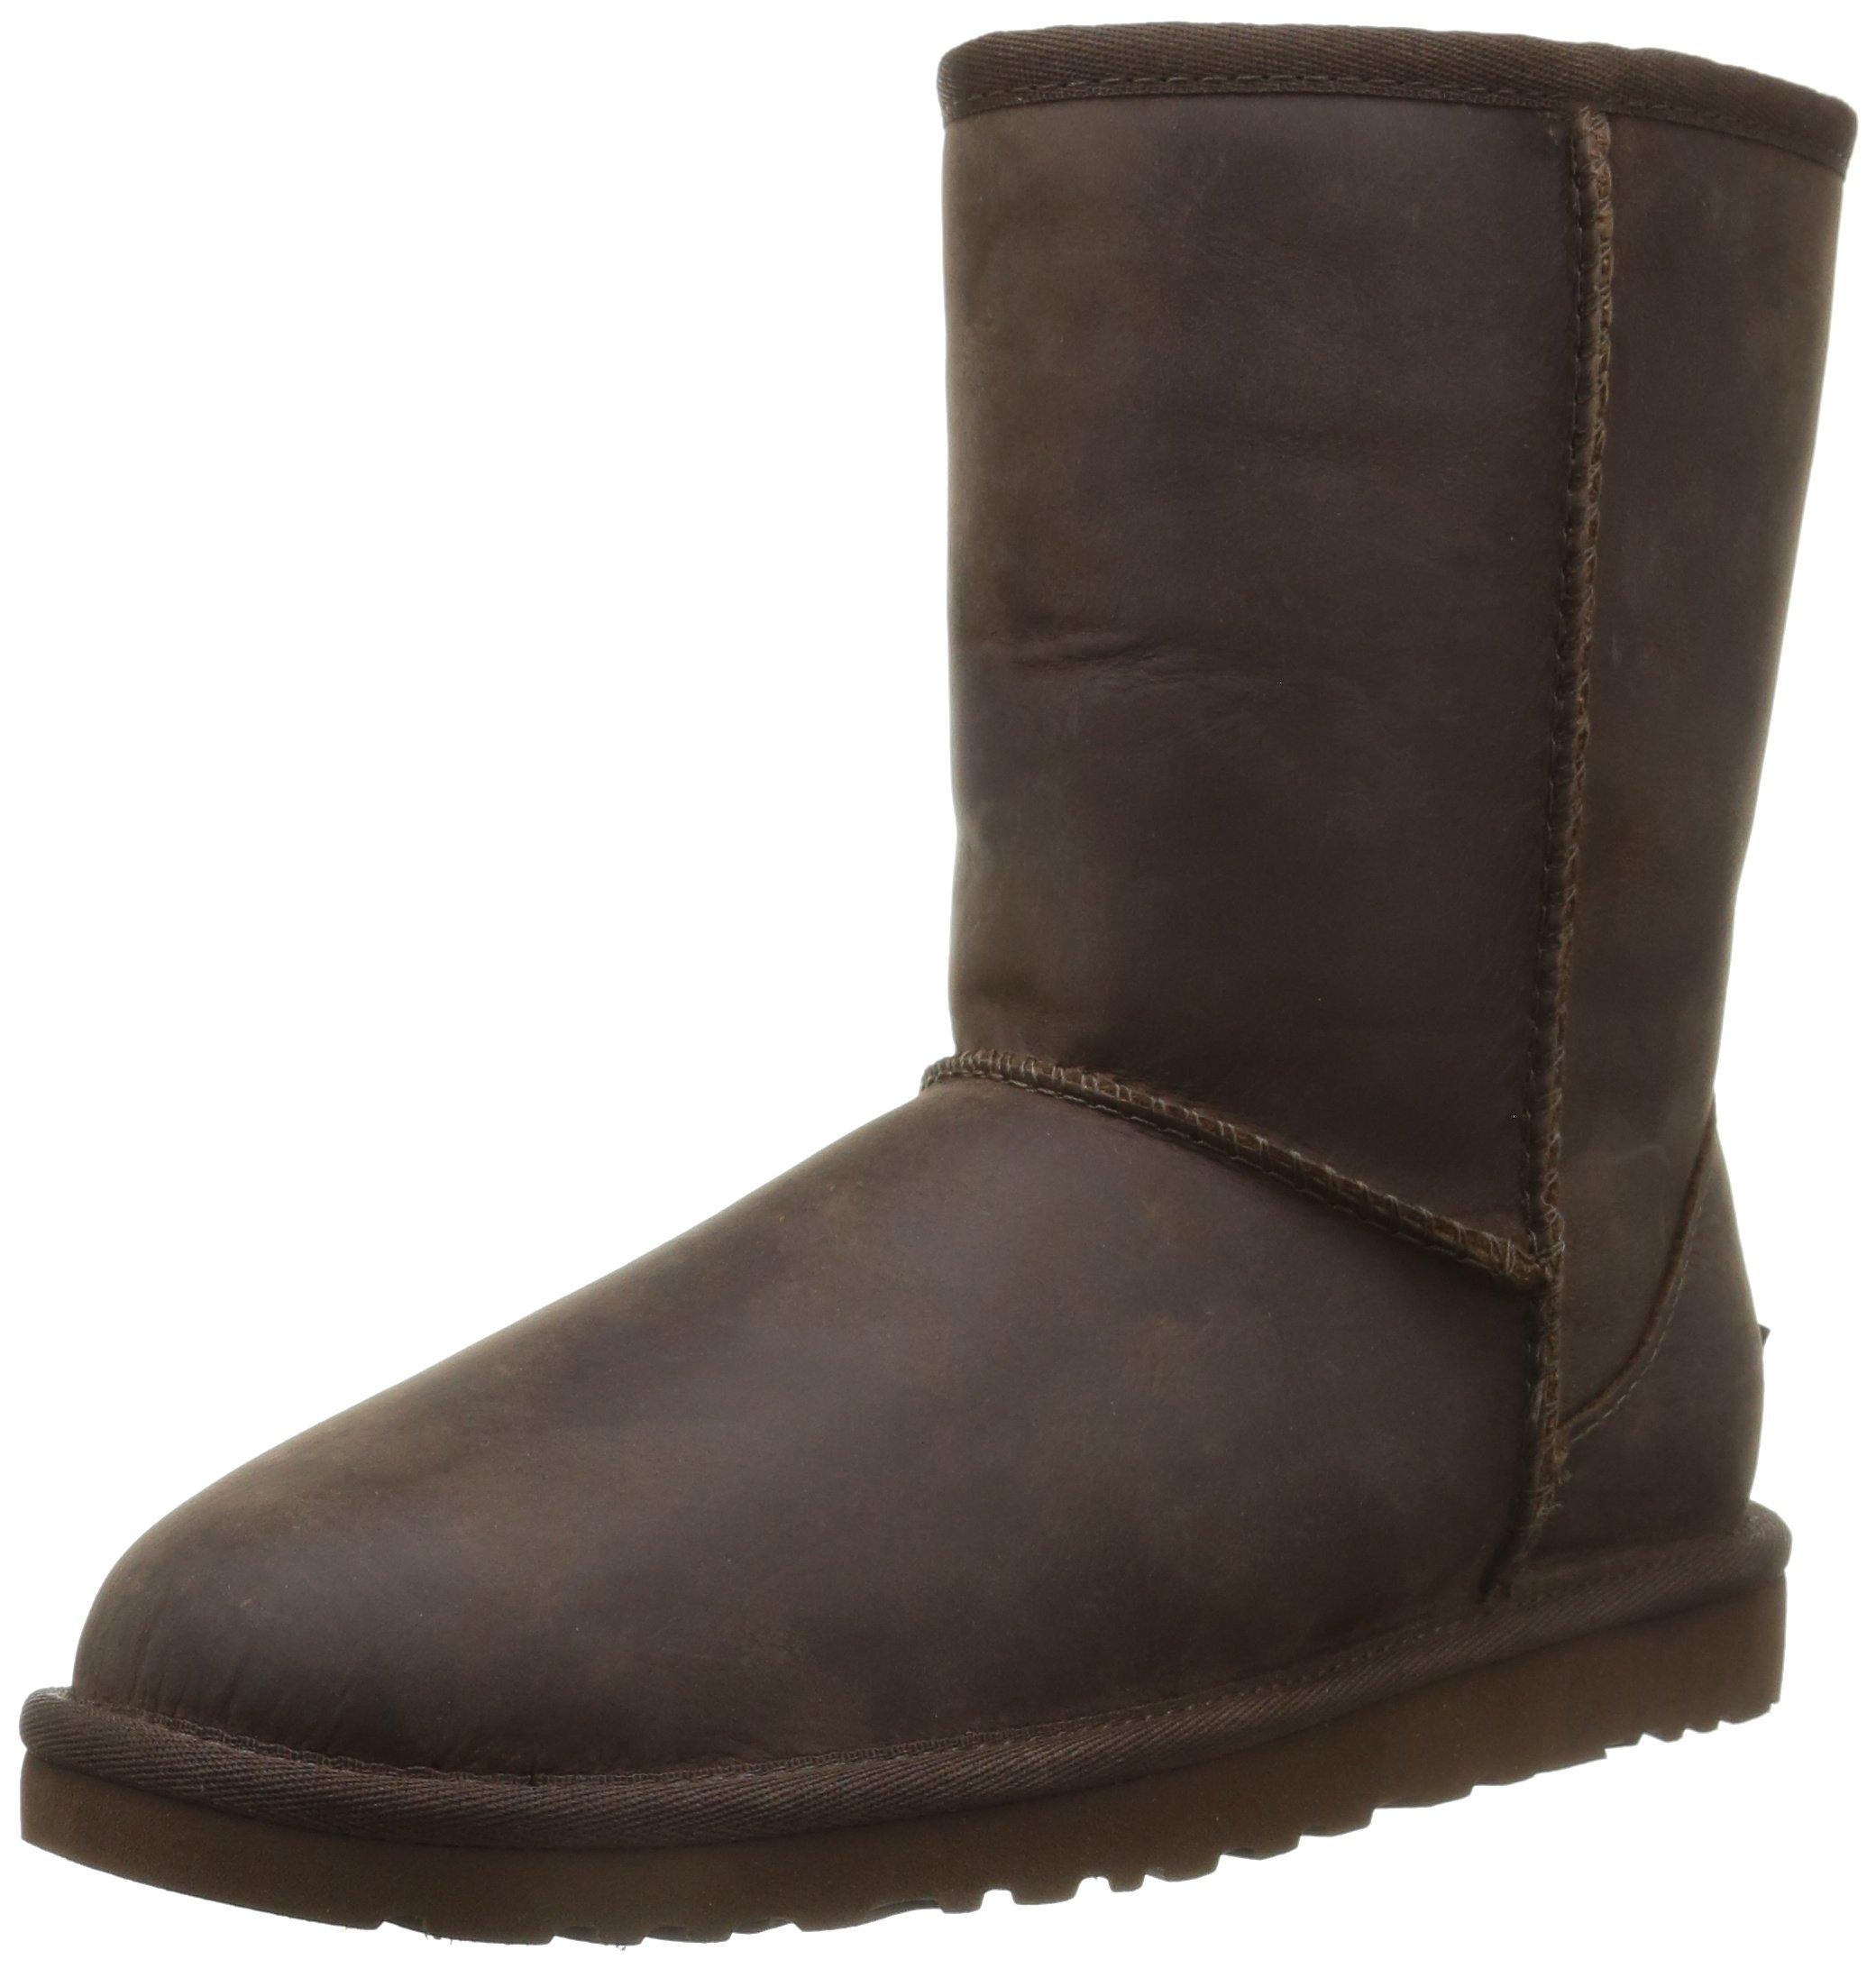 UGG Australia Women's Classic Short Brownstone Sheepskin  Boot - 5 B(M) US